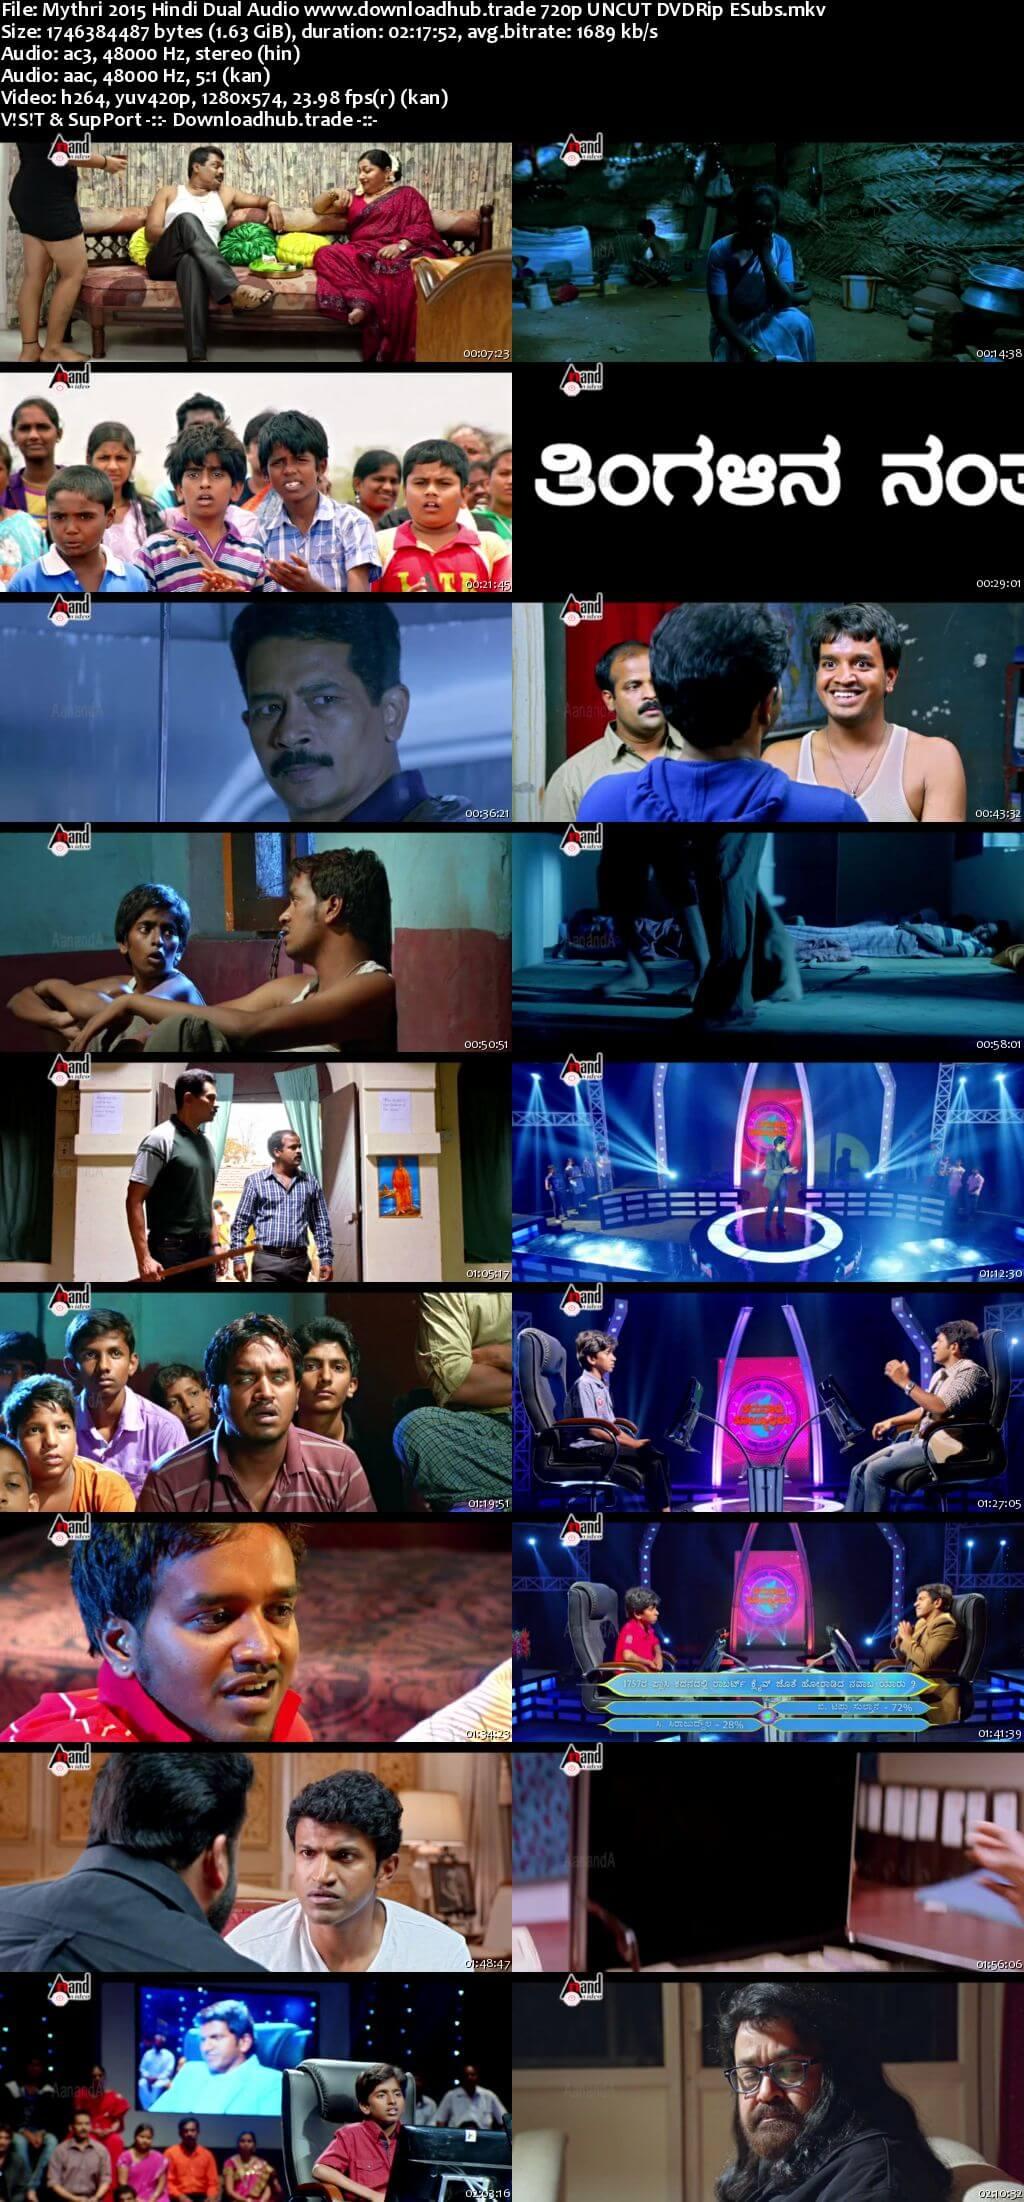 Mythri 2015 Hindi Dual Audio 720p UNCUT DVDRip ESubs